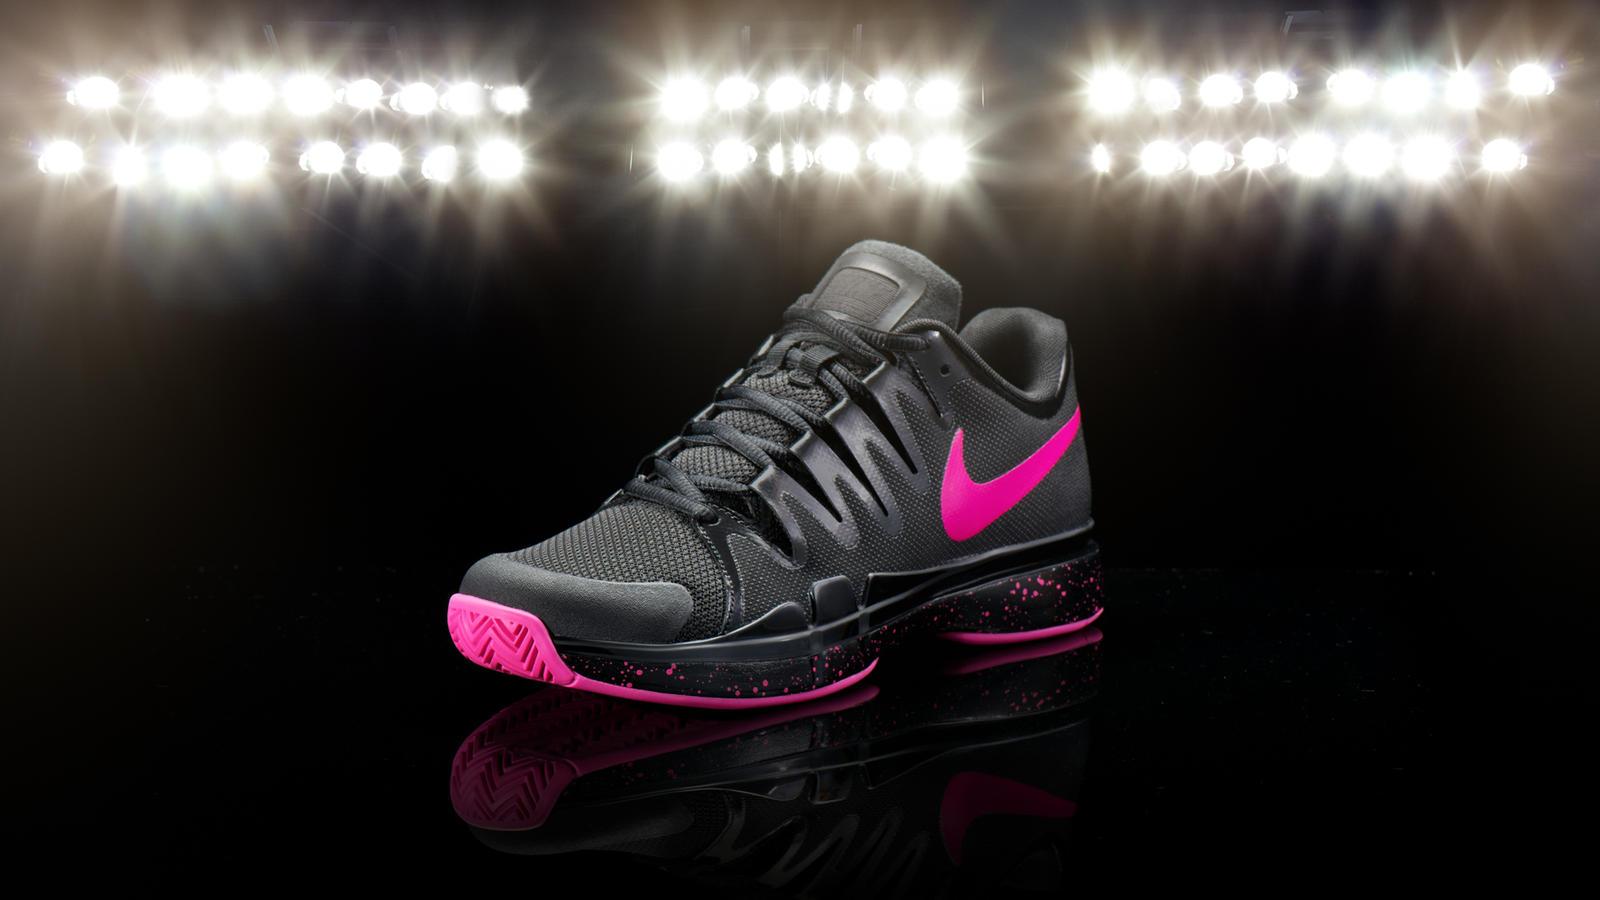 Nike Tennis NYC Night Collection - Footwear